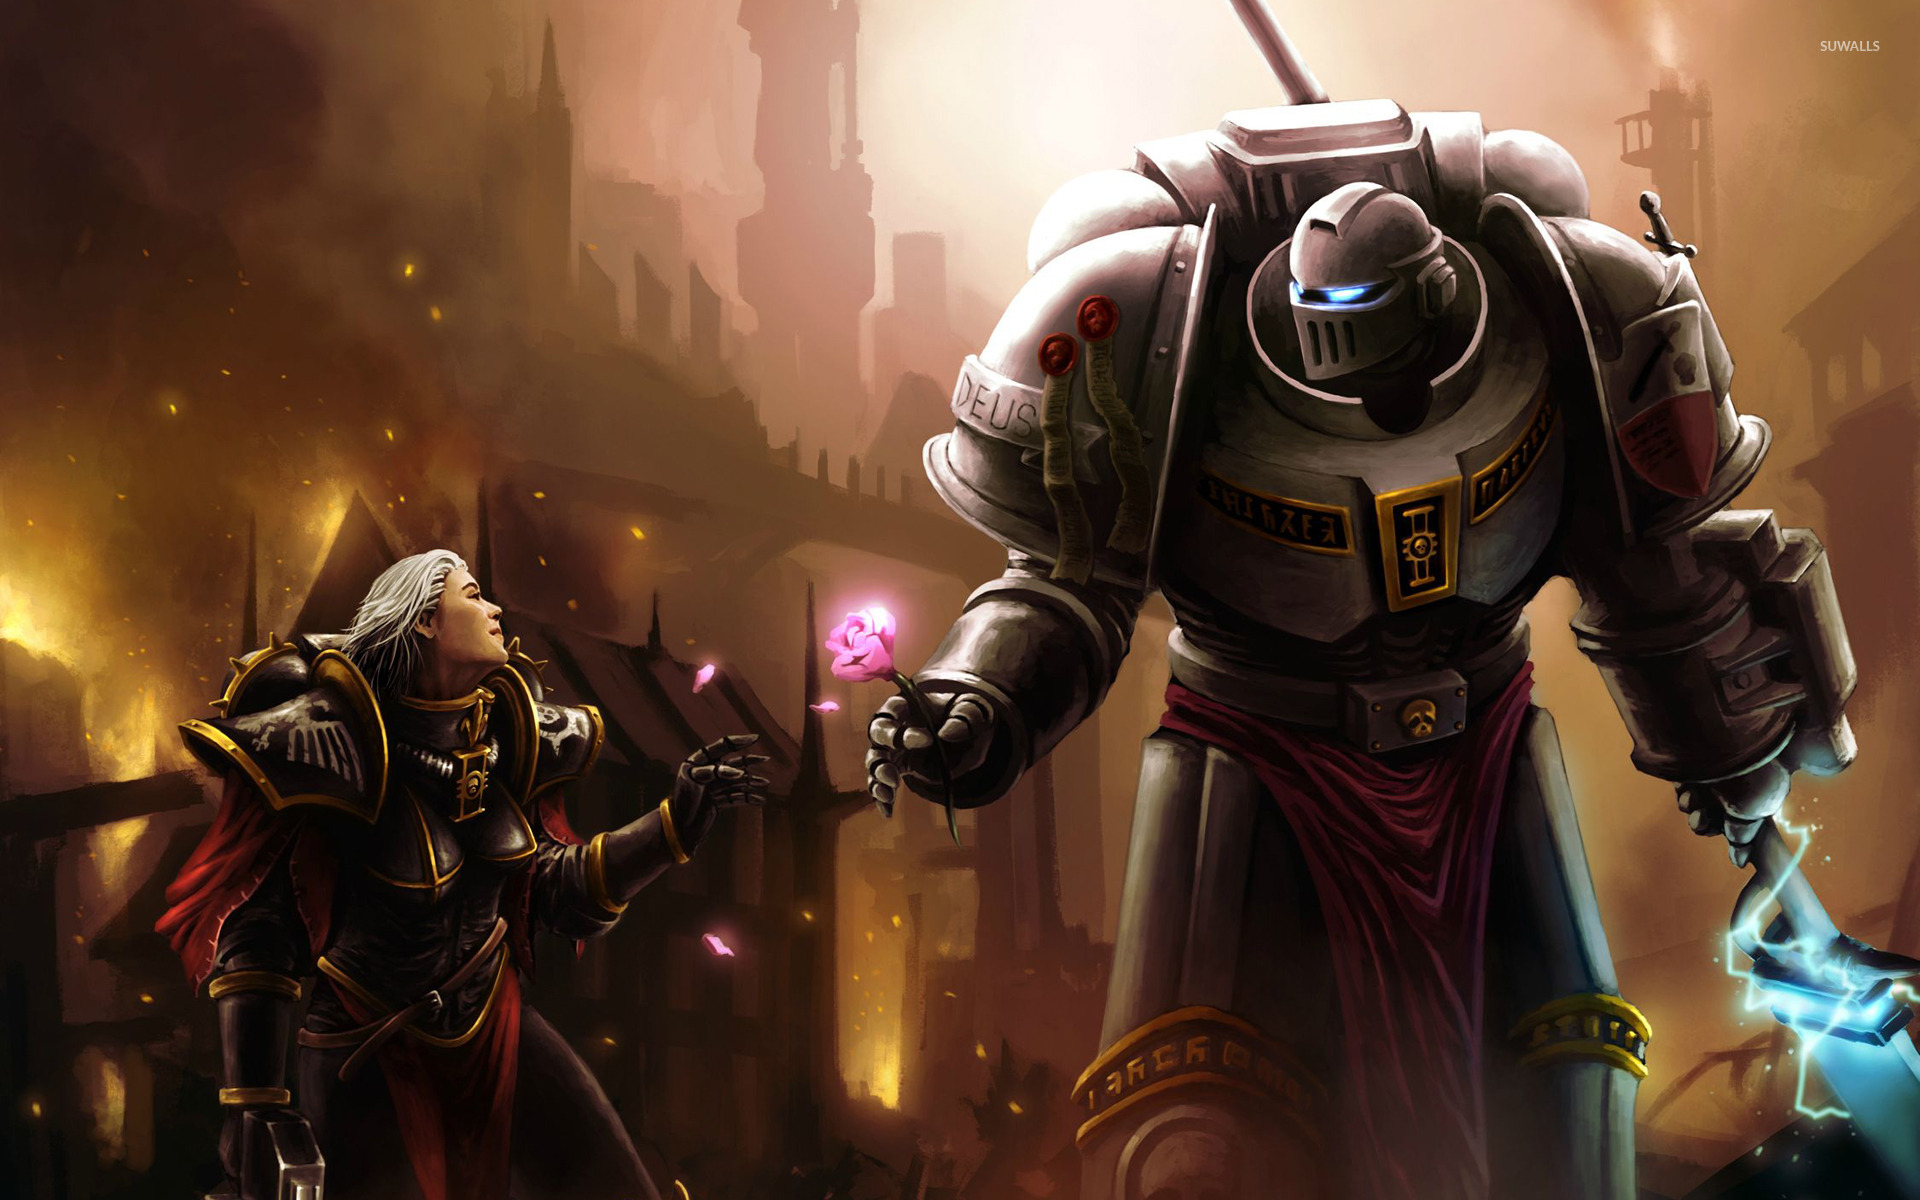 Warhammer 5 Wallpaper Game Wallpapers 15564